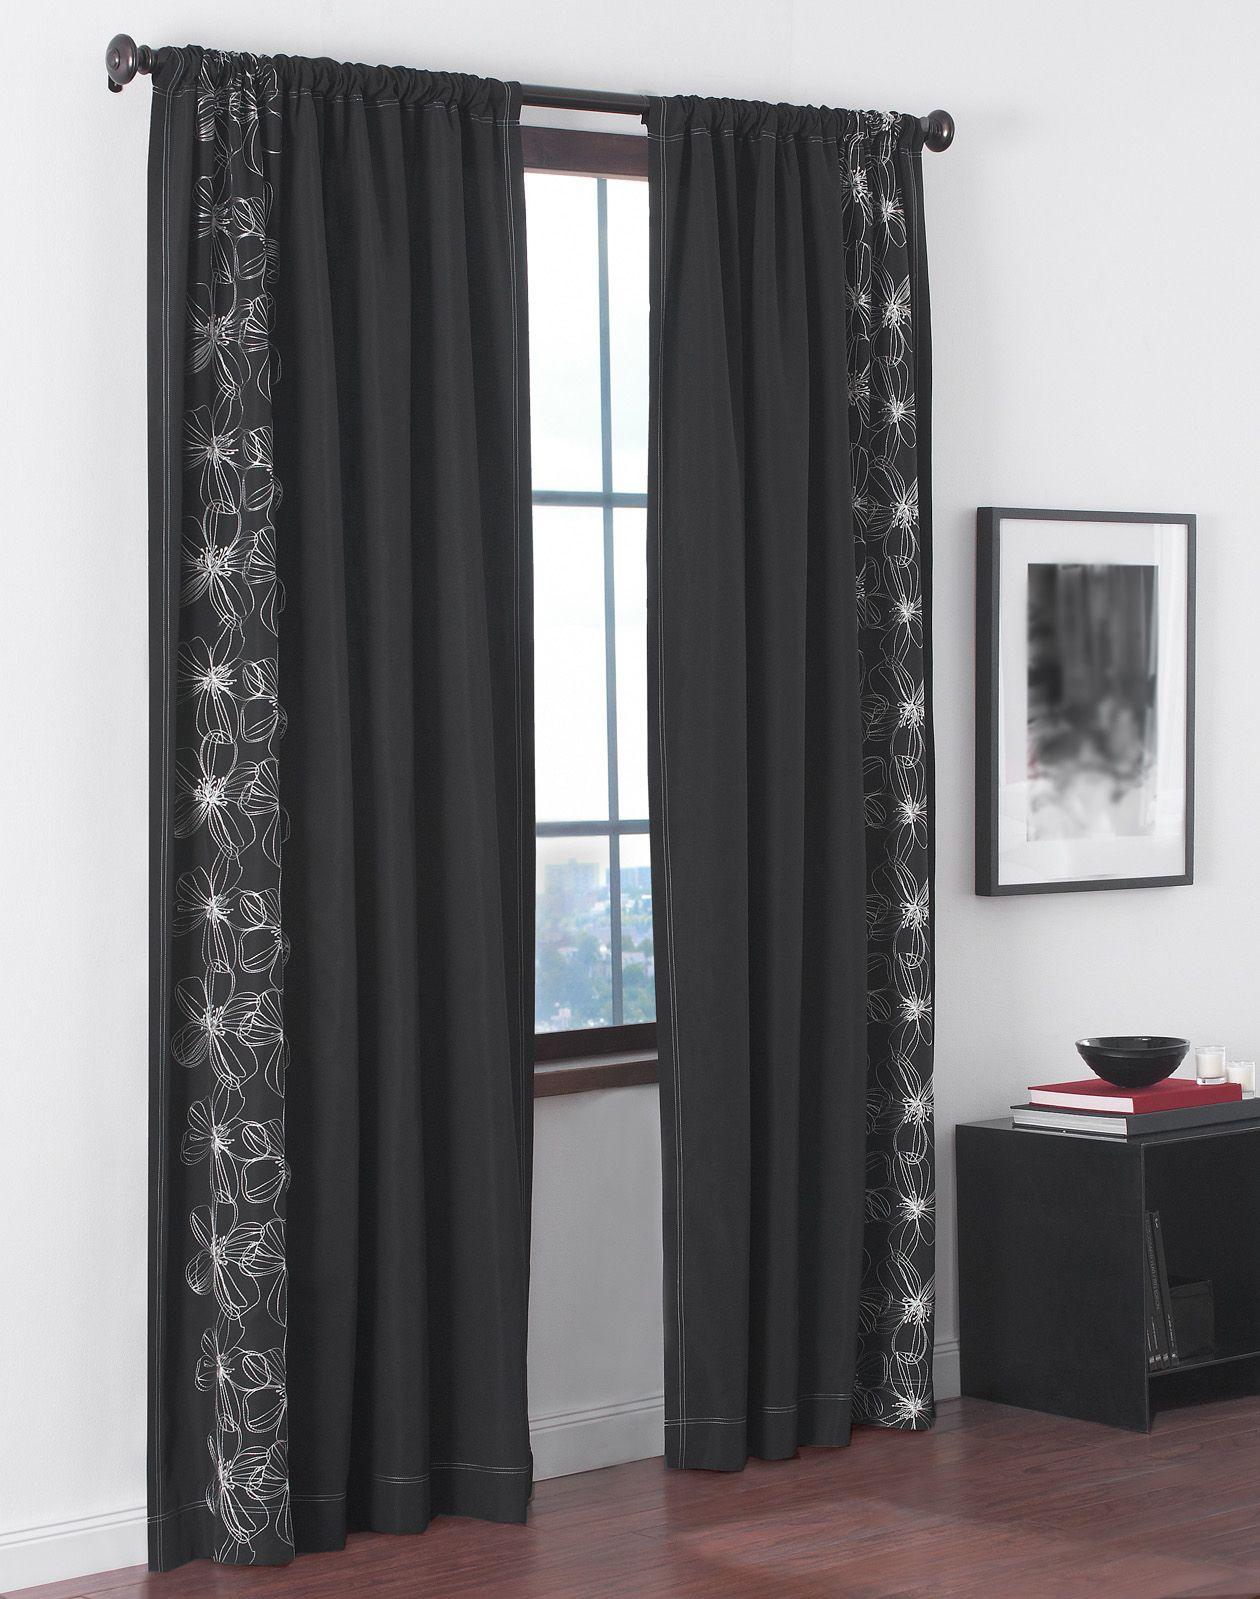 Ikea Panel Curtain Insitu Google Search: Window Curtains - Google Search